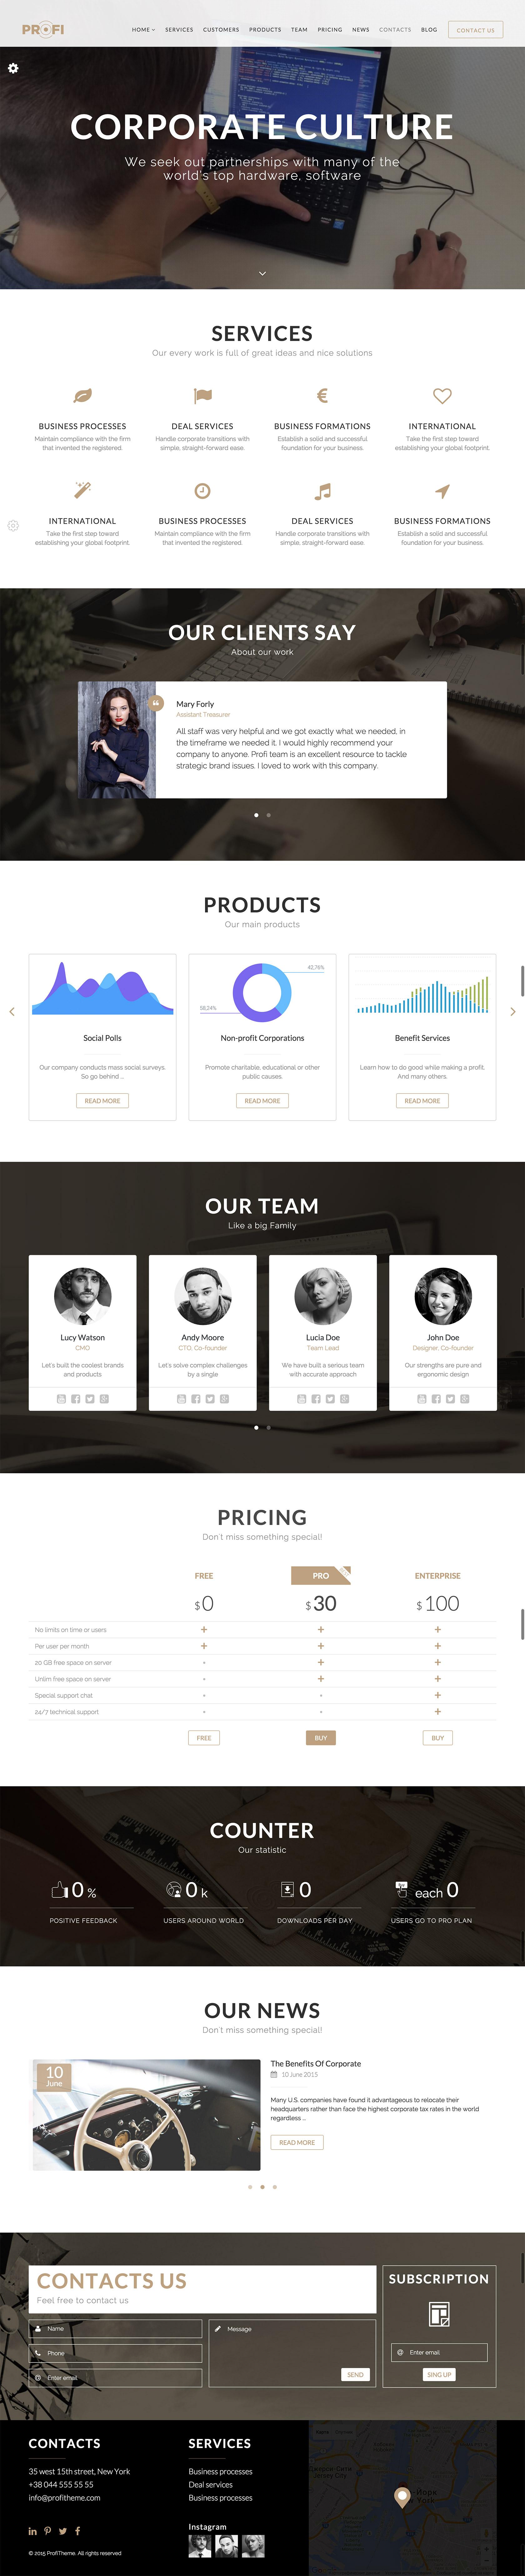 Profi - Multipurpose Corporate HTML Template by Iondigital   ThemeForest